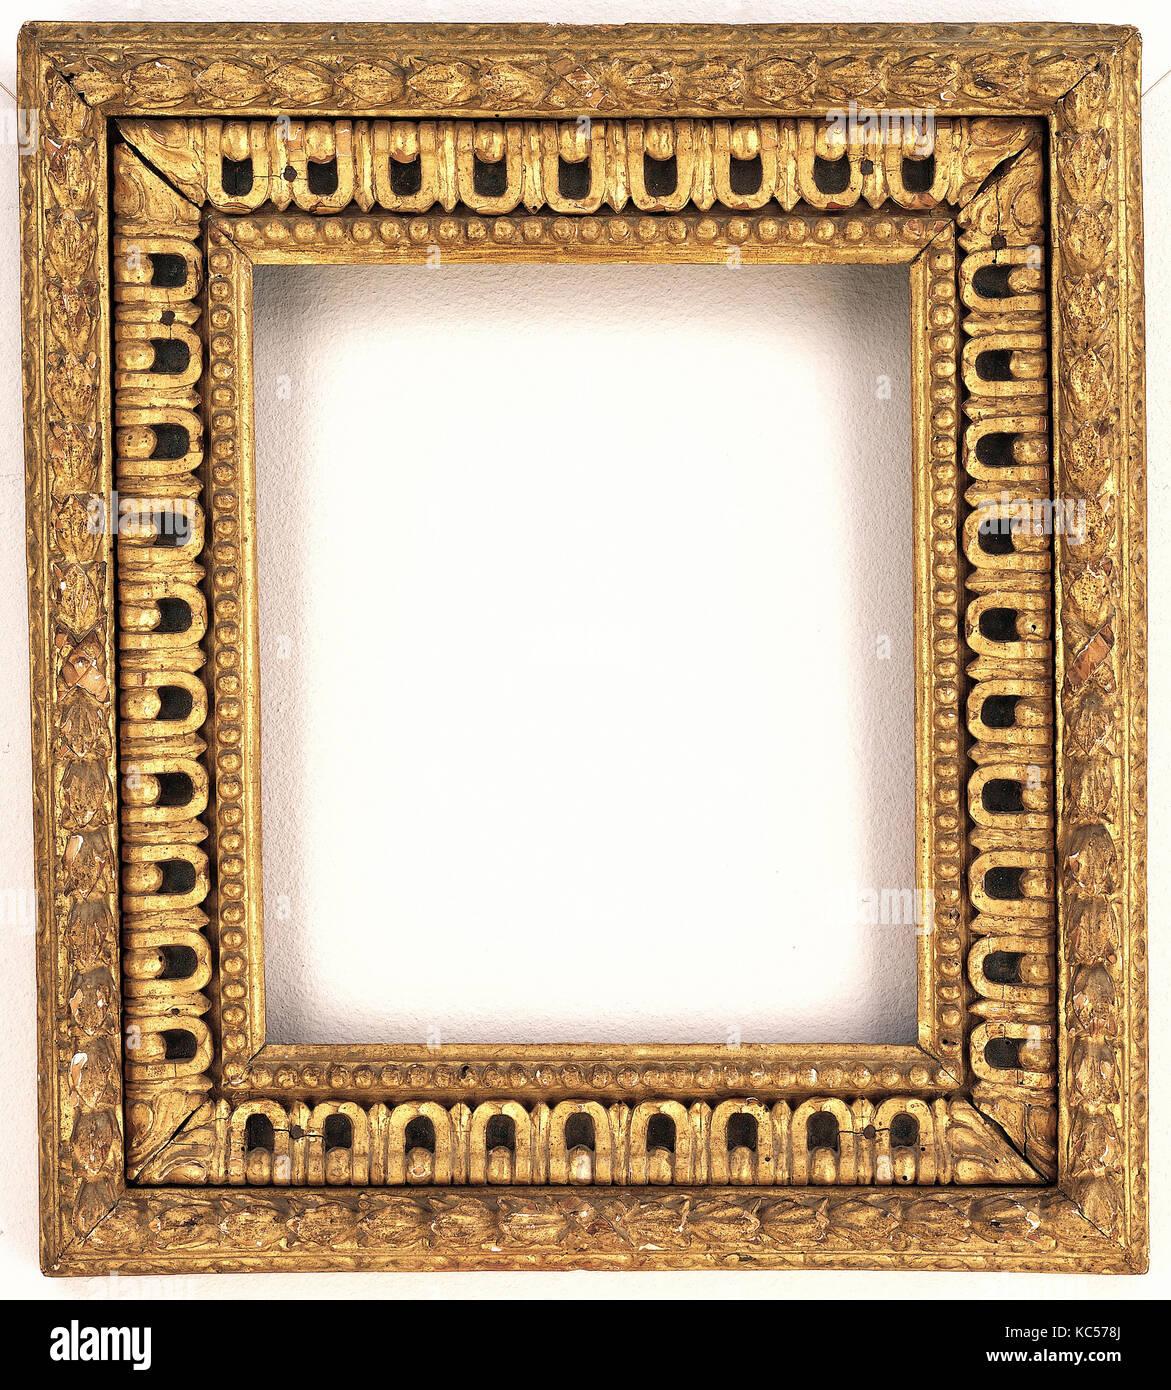 Bastidor cassetta, 1575-80, italiano, Florencia, álamos, total: 19 1 ...